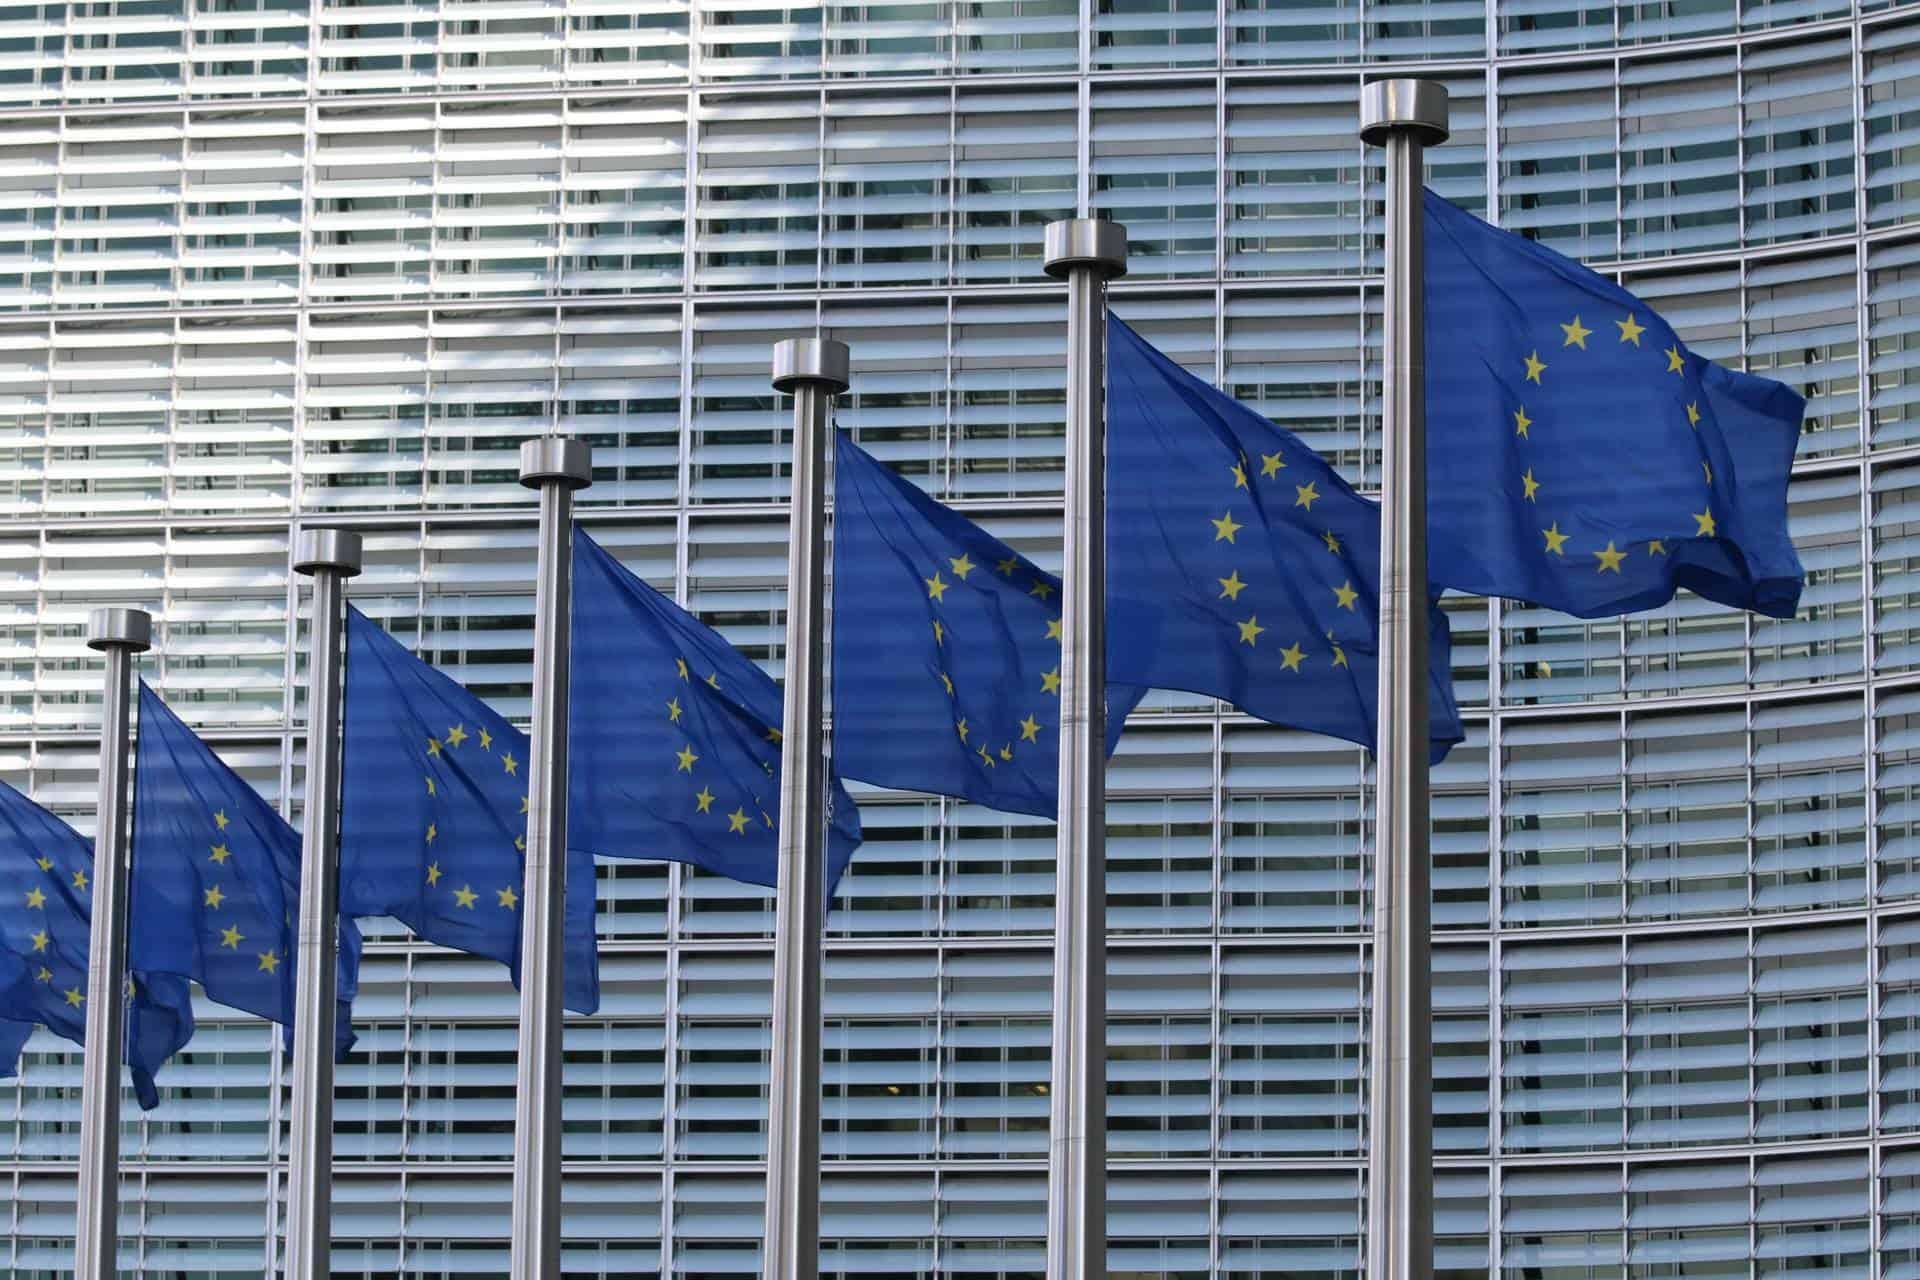 ETIAS Guide to Visa-Free Travel in Europe